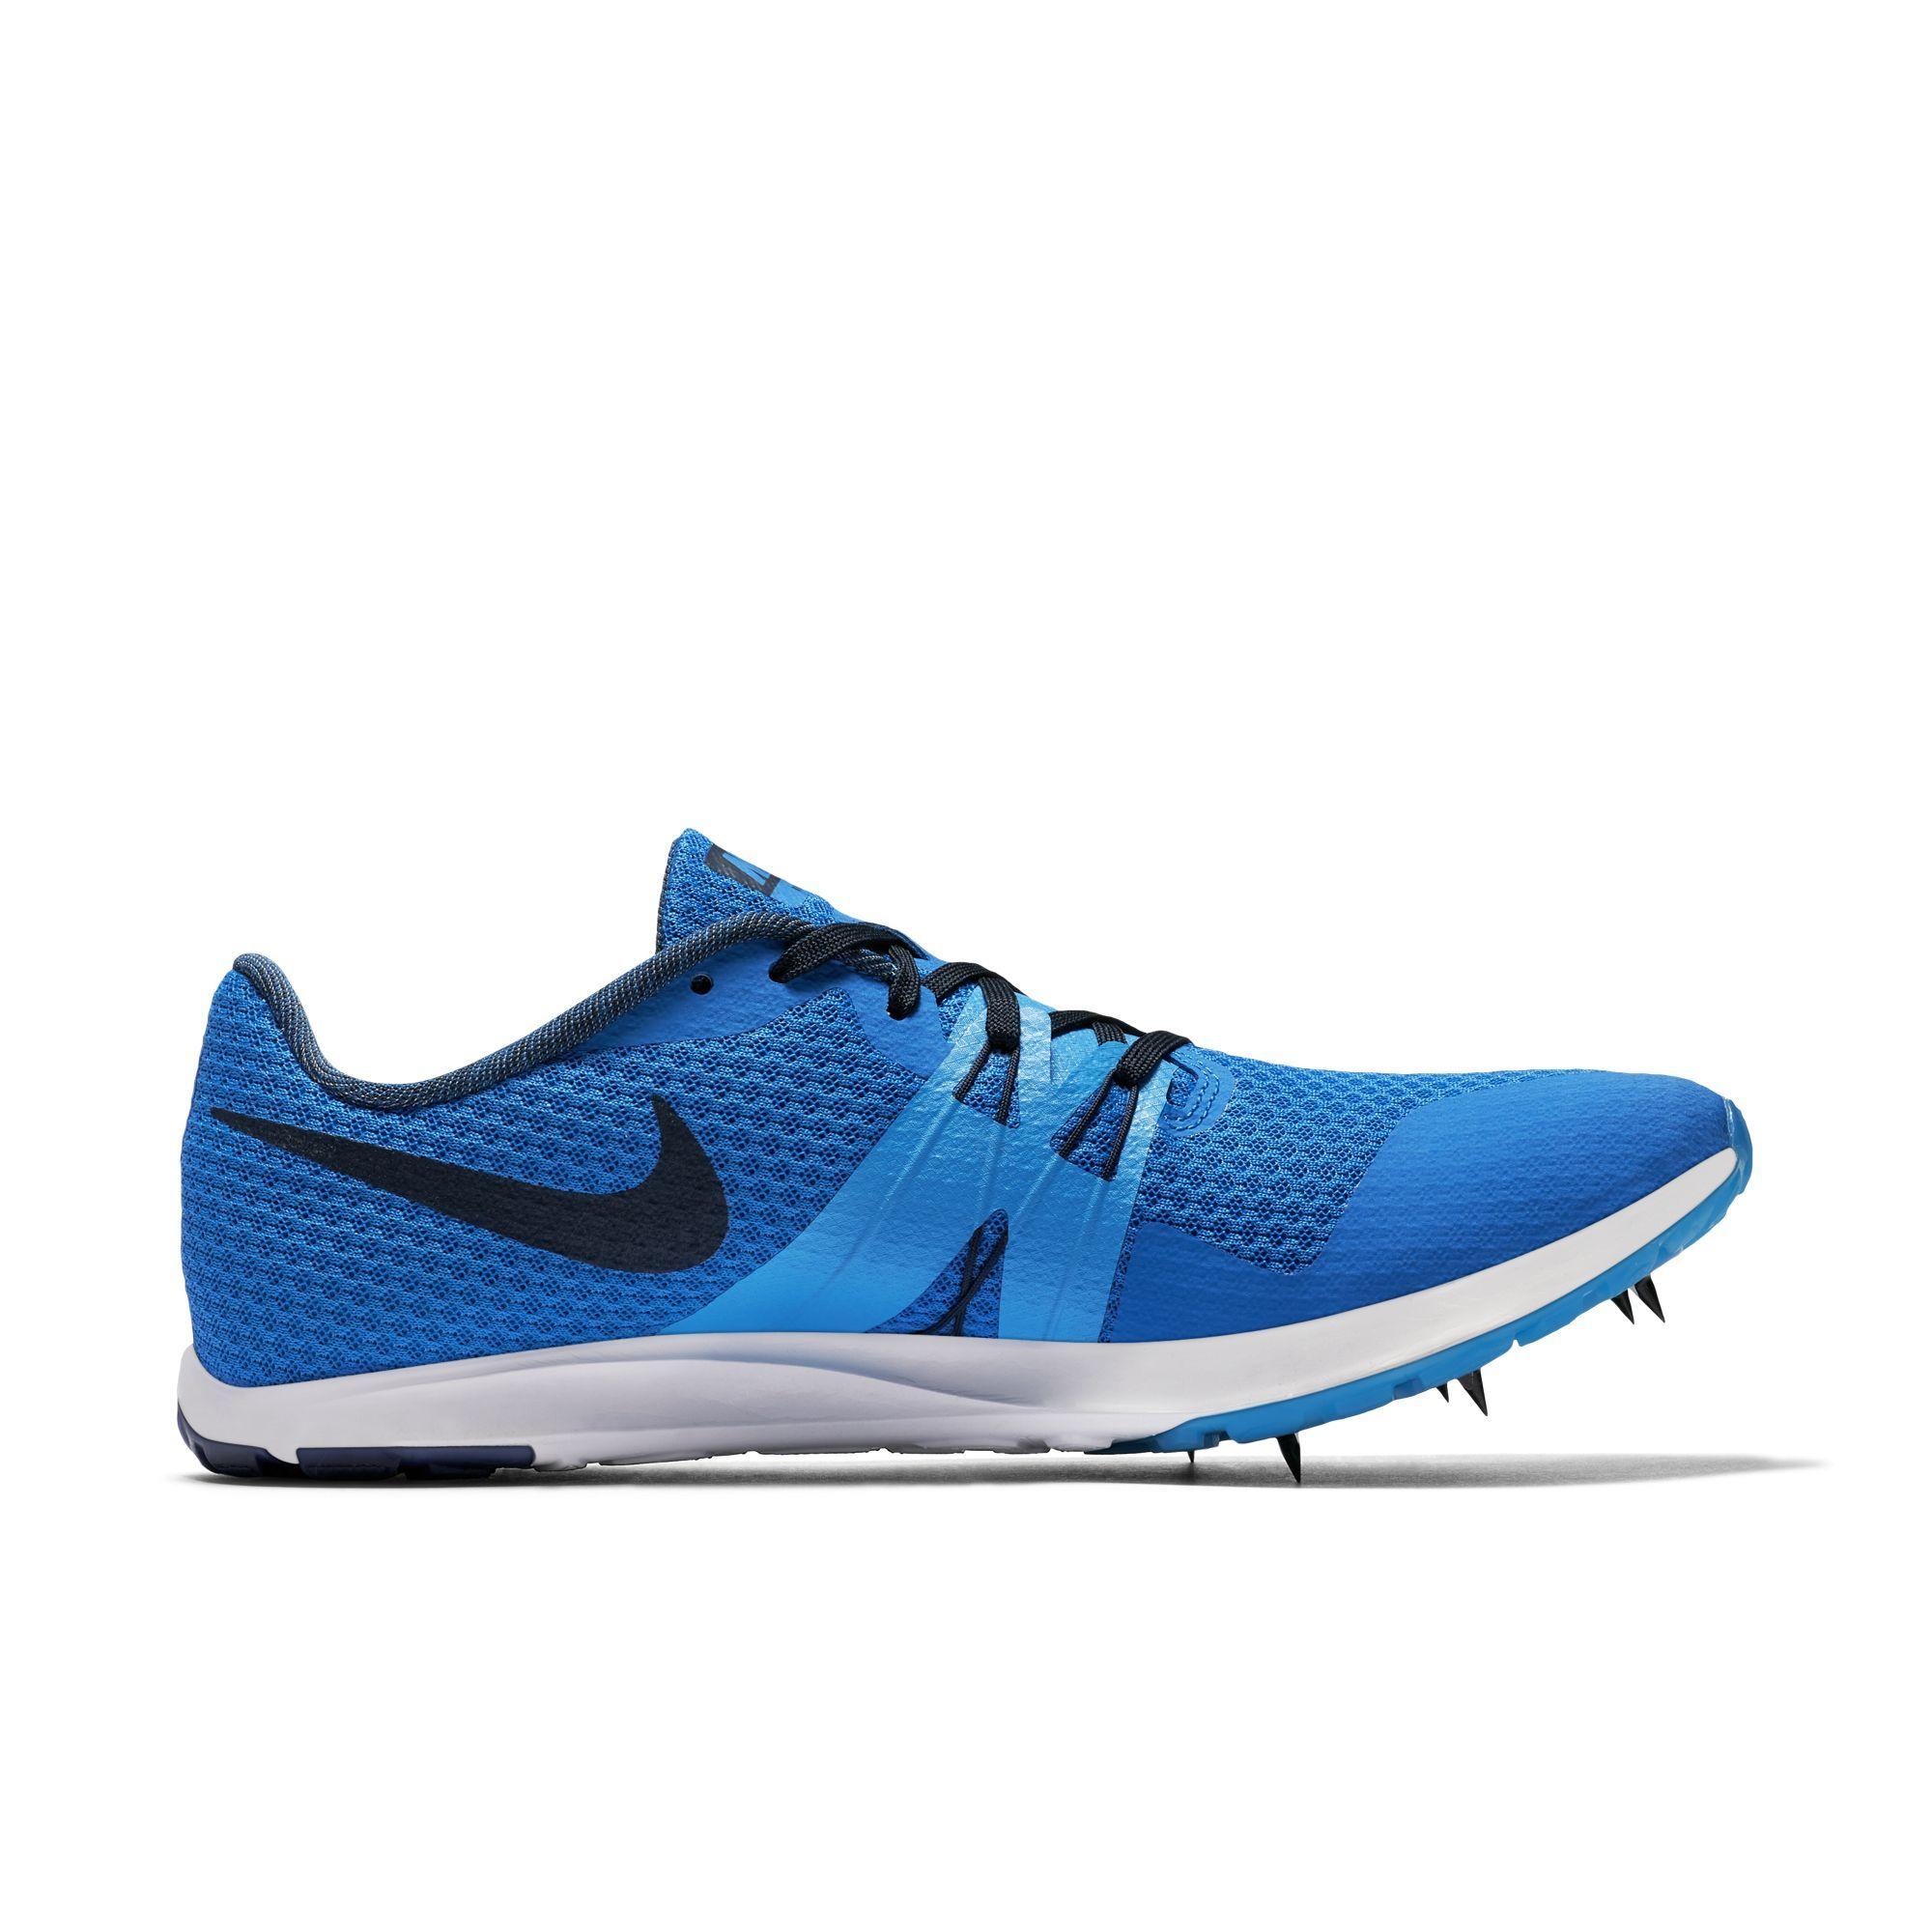 hot sale online b8a24 0242f Mens  Nike Zoom Rival XC Spike  Fleet Feet